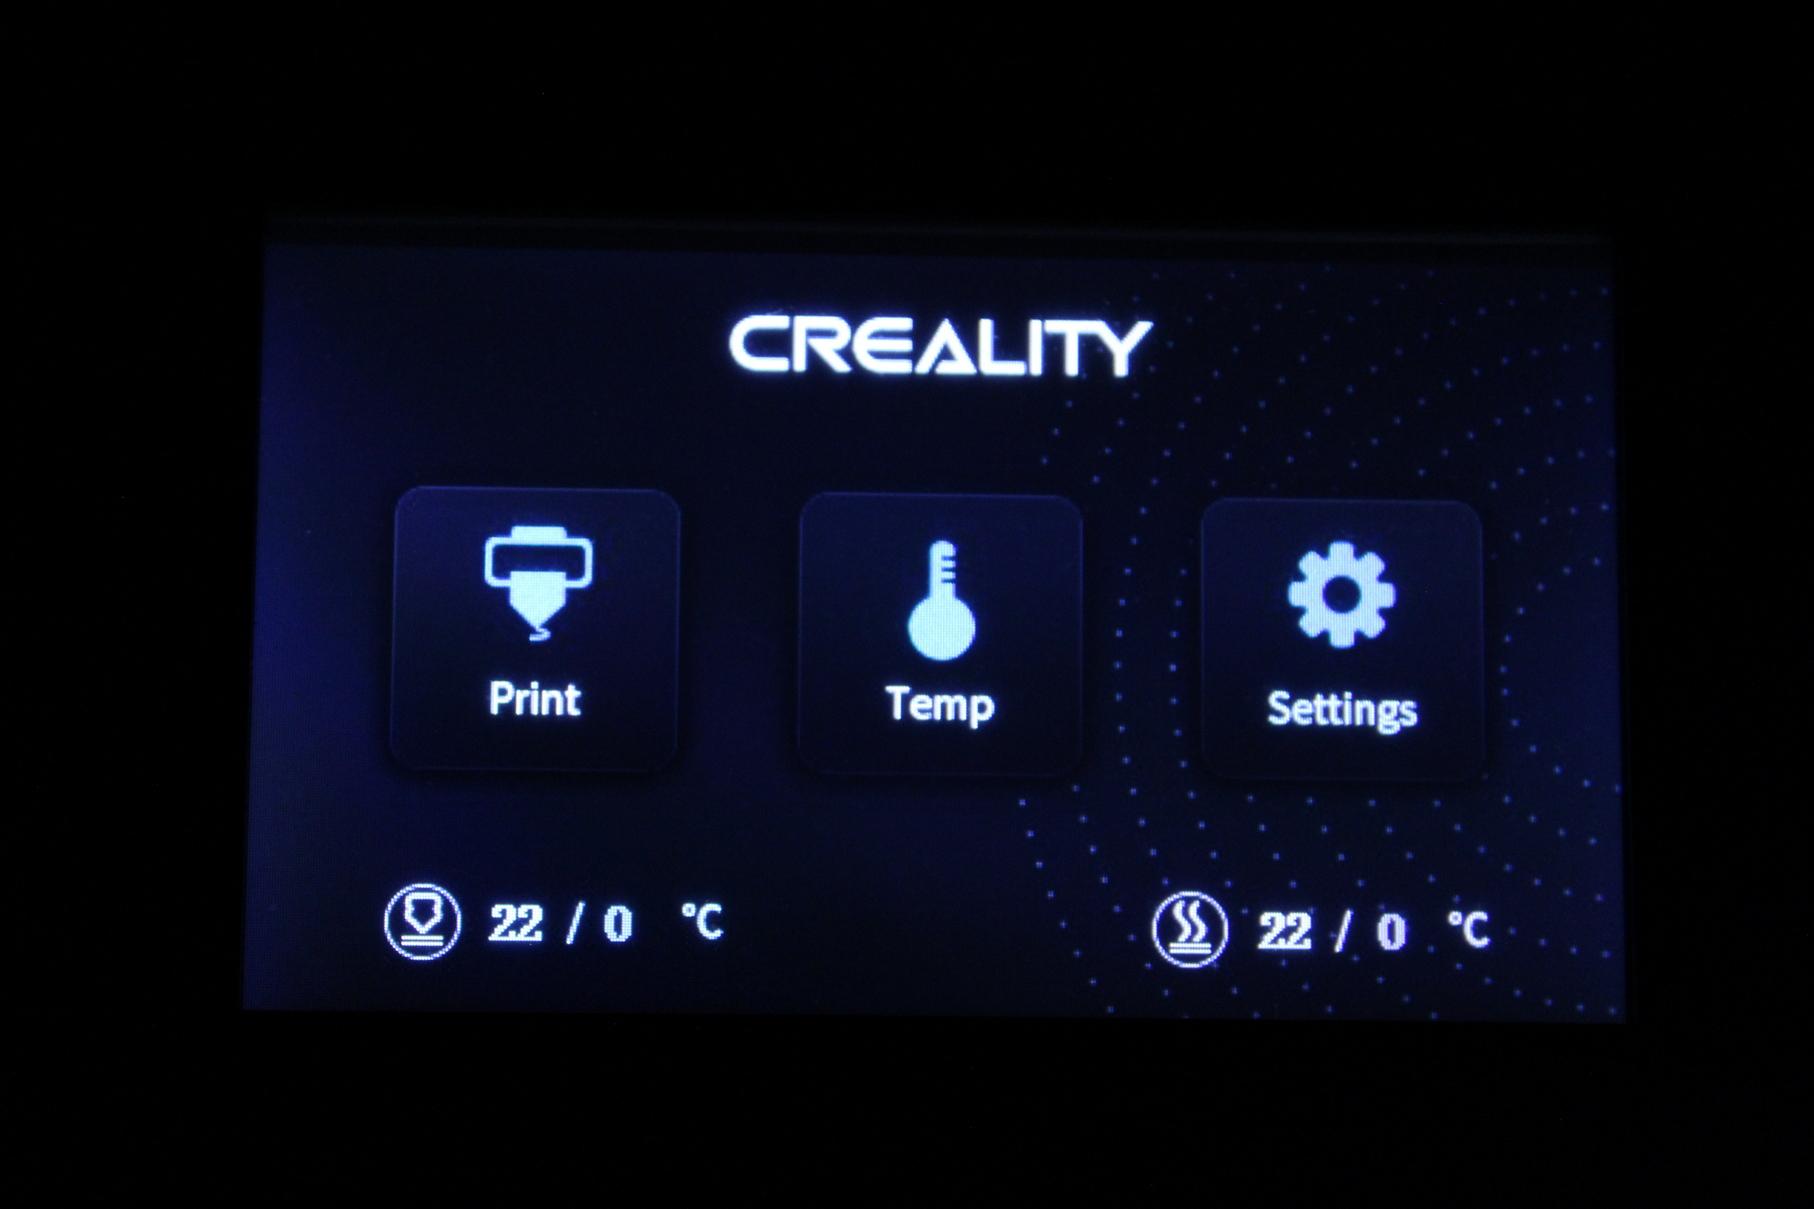 Creality-Sermoon-D1-TFT-Screen-Interface-1